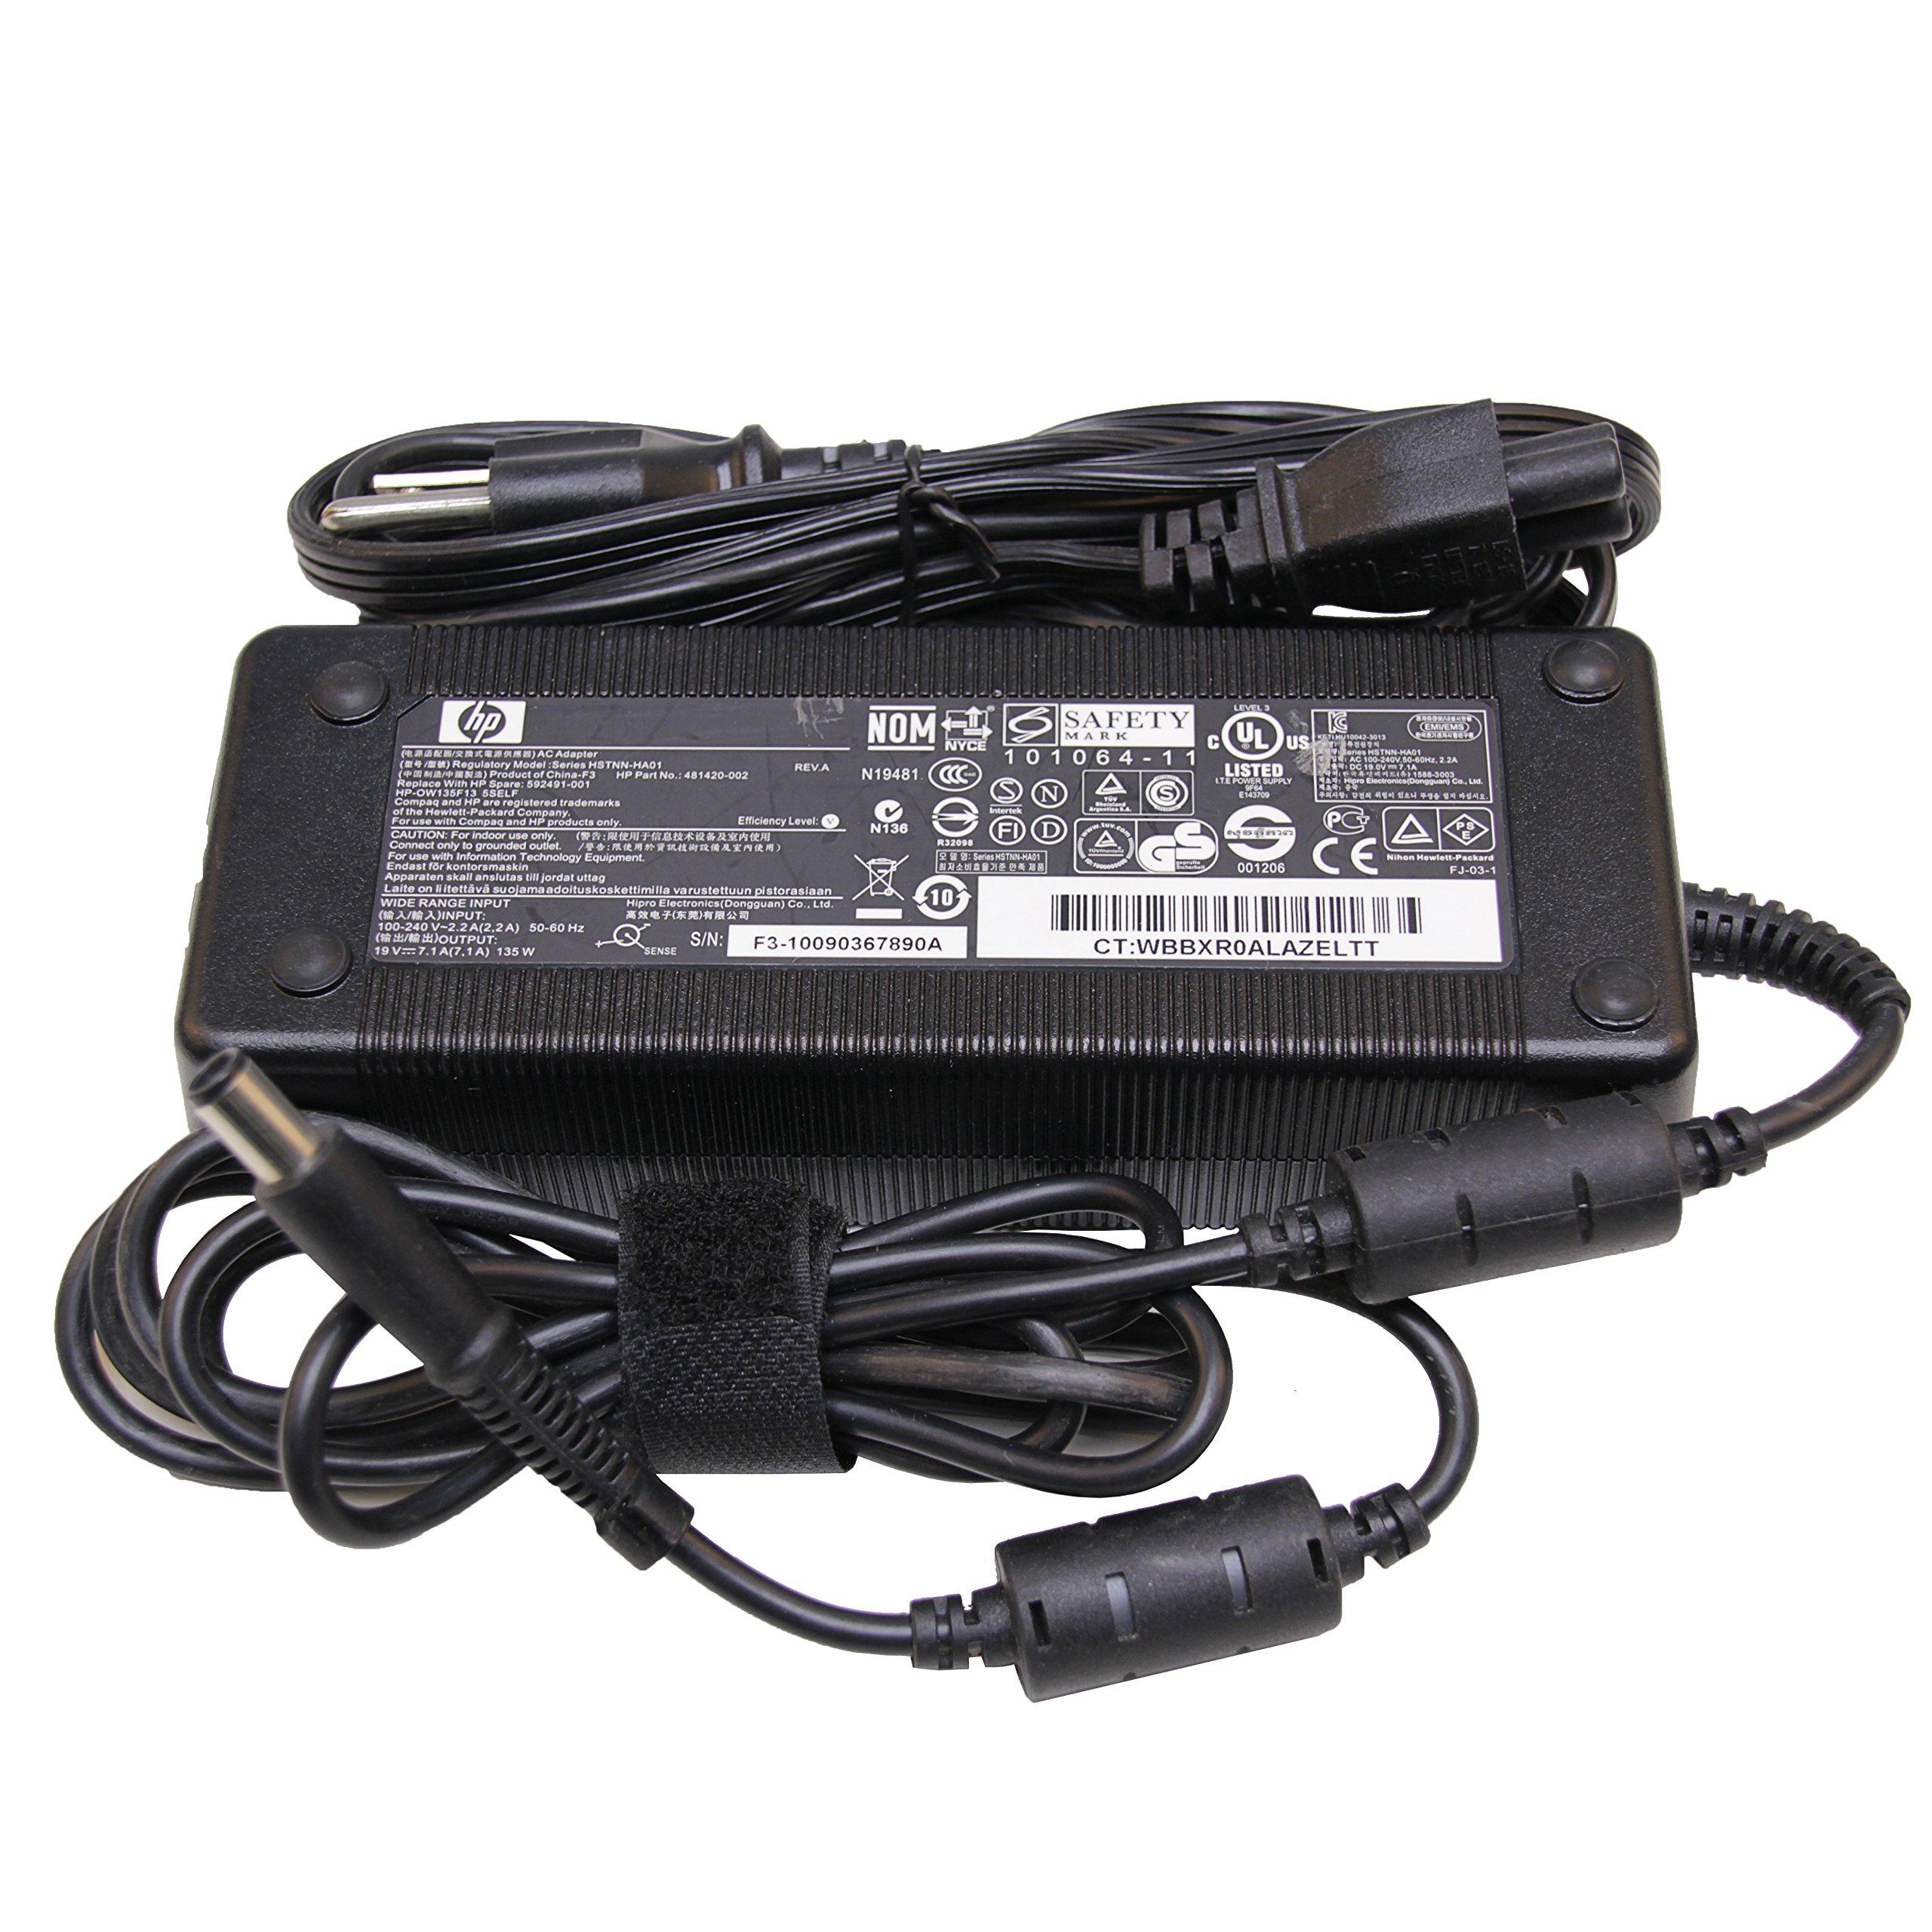 HP Compaq Original Smart AC Adapter 135W for HP Compaq Business NW8440 NW9440 NX6310 NX6315 NX6320 NX6325 NX7300 NX7400 NX8410 NX8420 NX9420 TC4400 397747-001 135 Watt 19.5V Power Supply Charger Cord